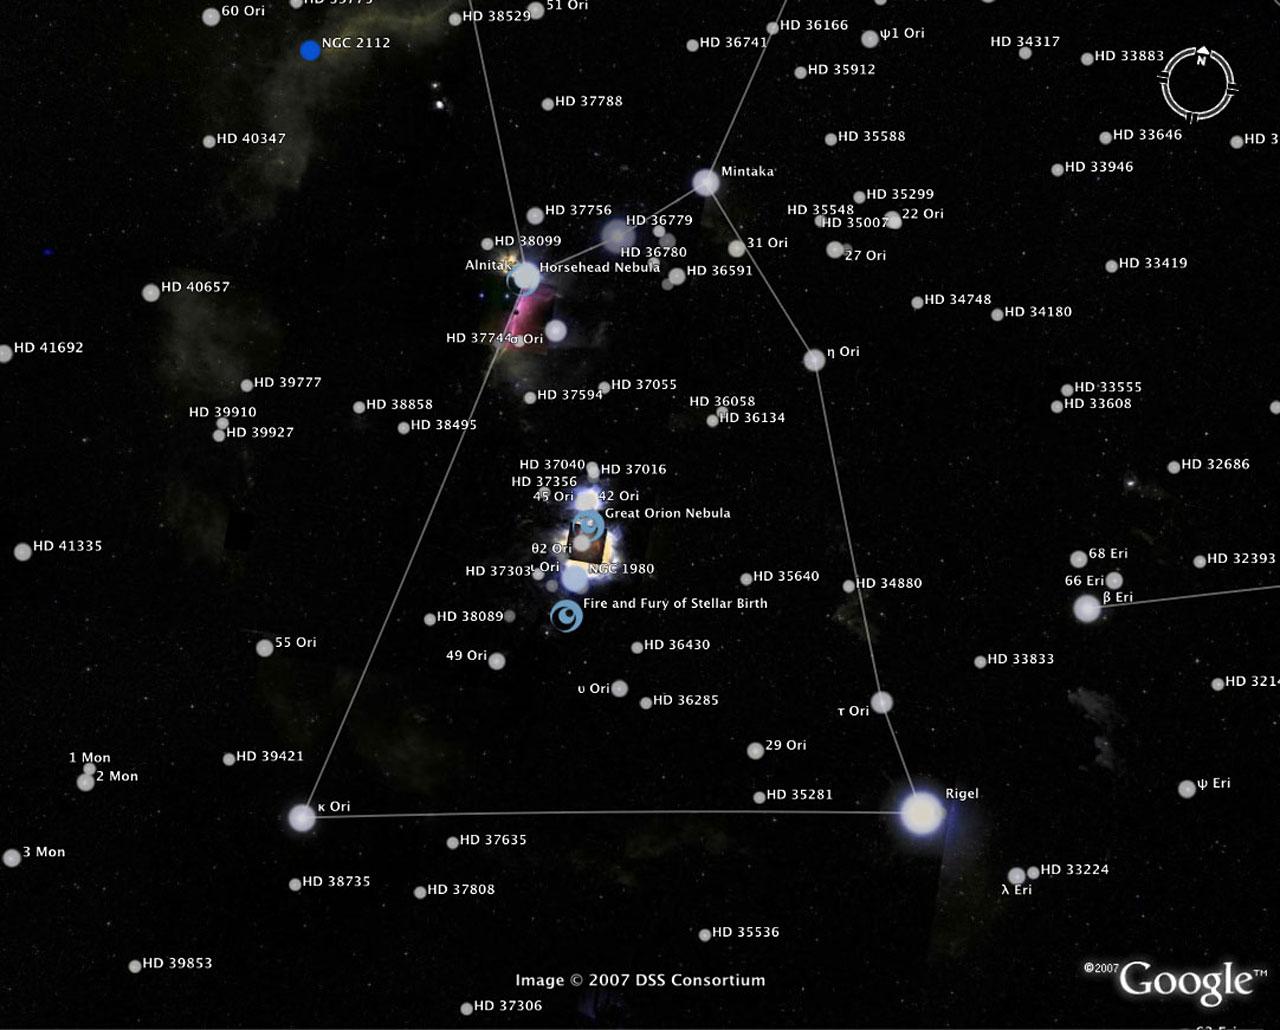 f502bffc1570 The Sky in Google Earth